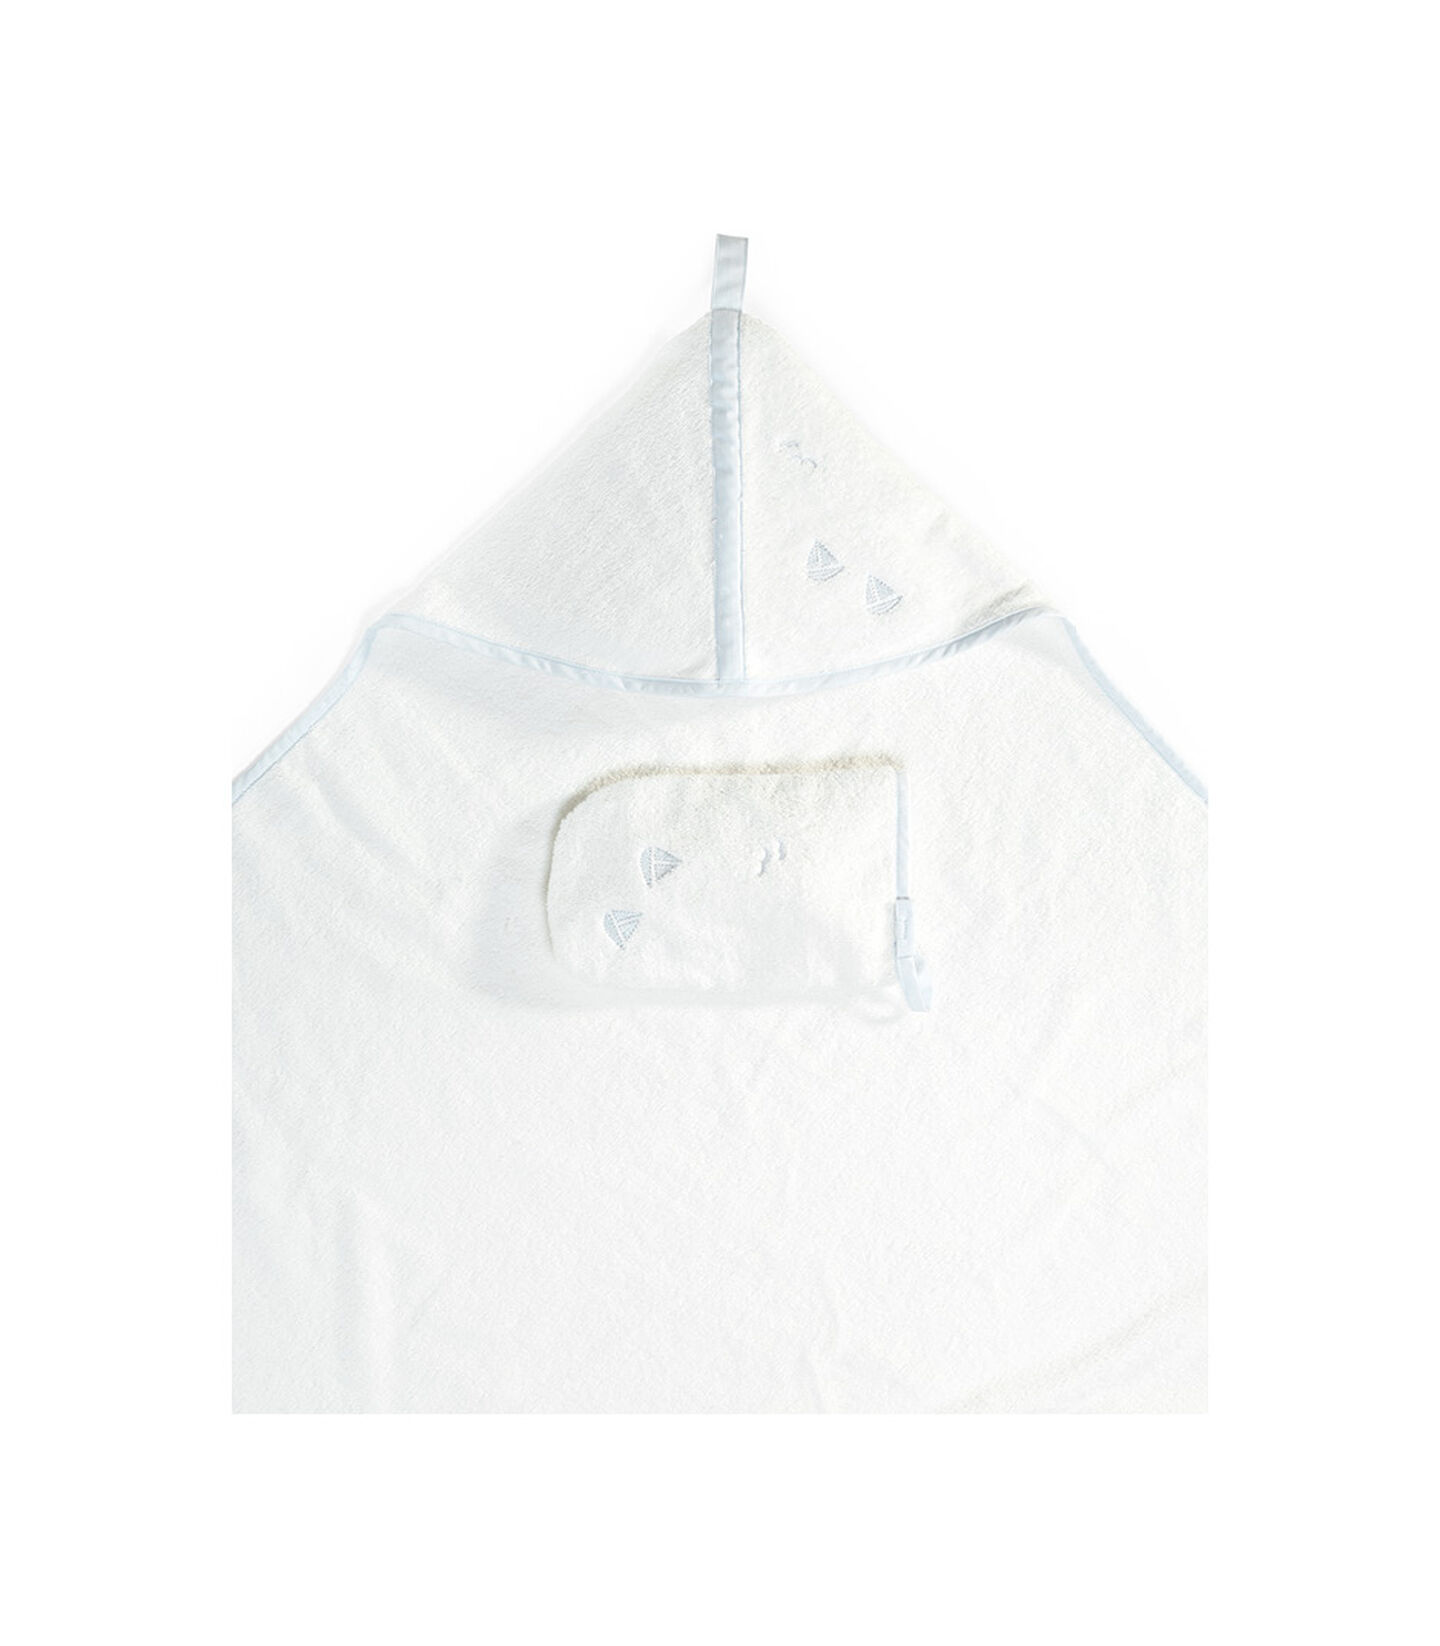 Stokke® Hooded Towel Blue Sea, Blue Sea, mainview view 2